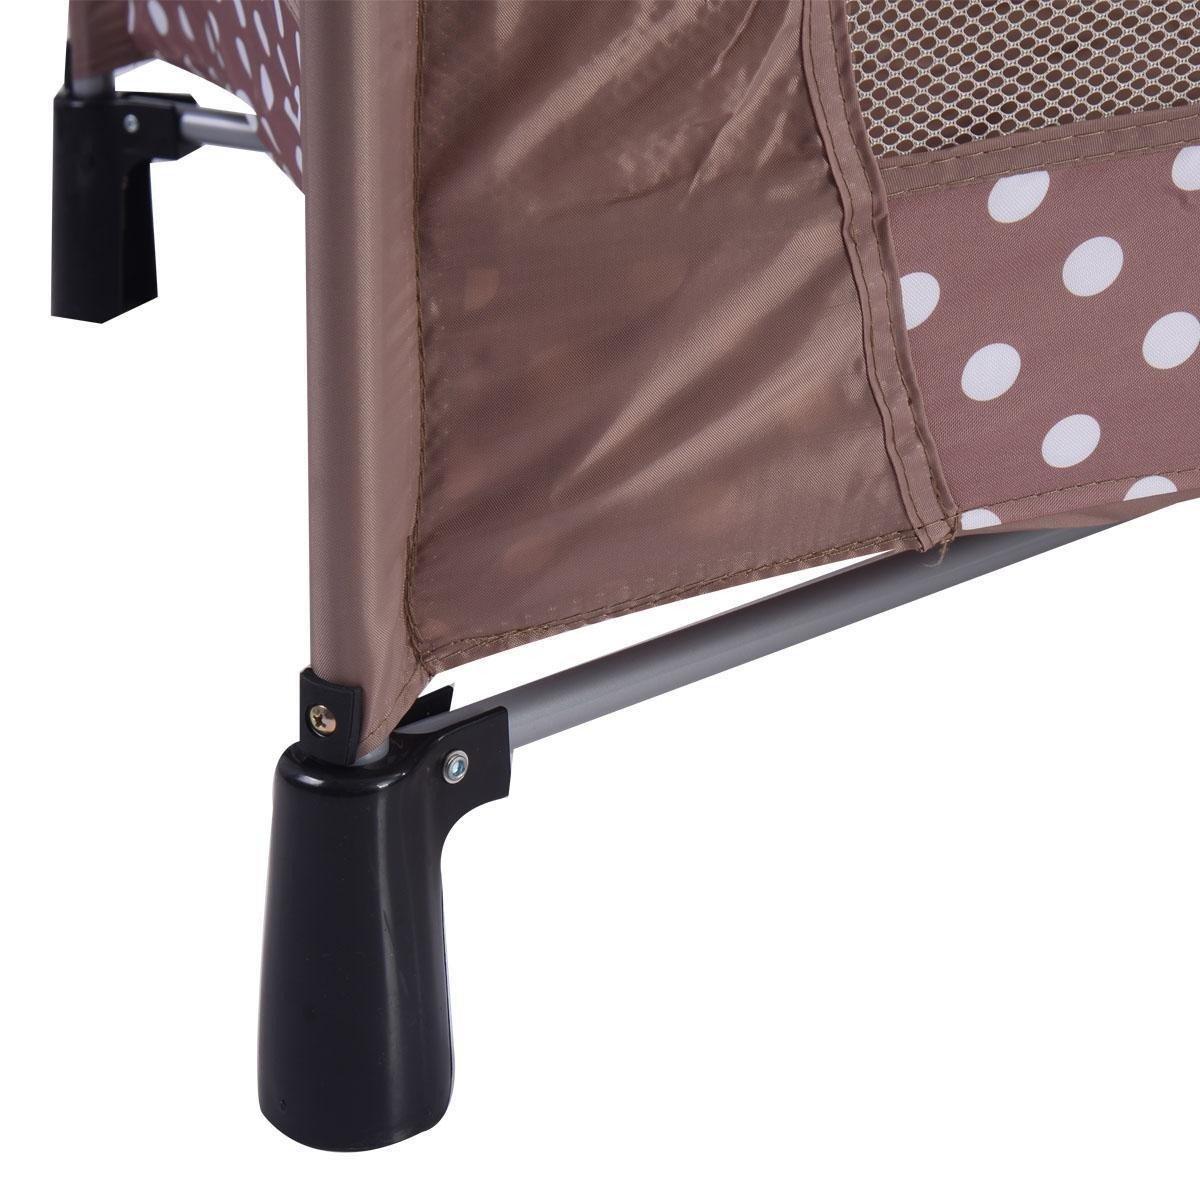 Beige Sleeping Playpen Baby Bassinet Portable Bed Crib Infant Children Kids Furniture With Ebook